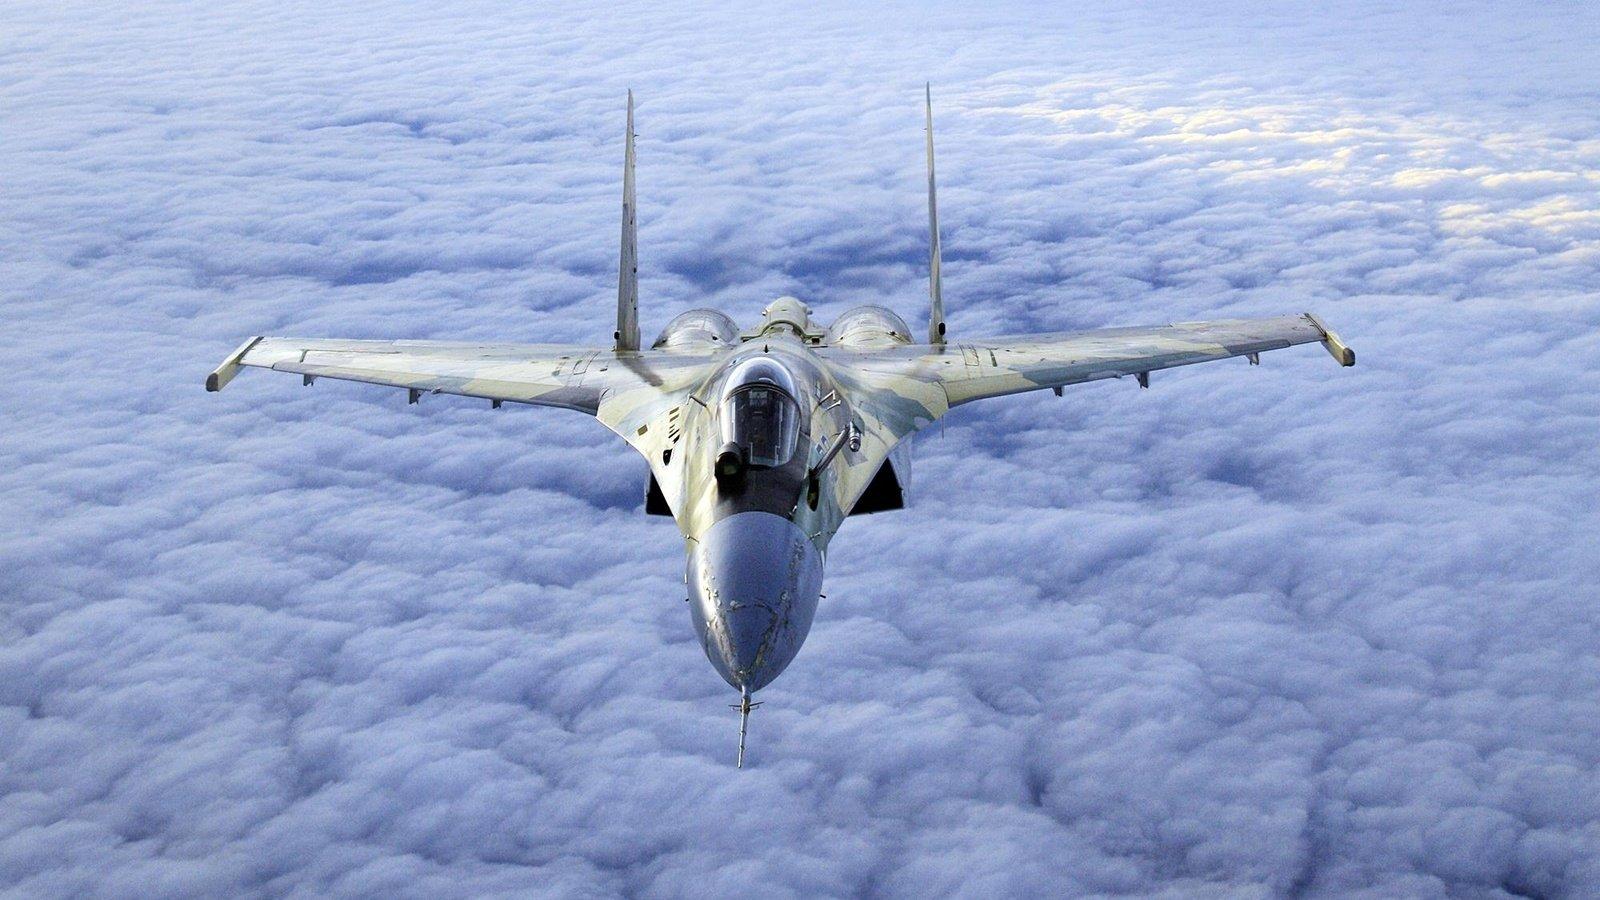 Обои Облака, полет, истребители. Авиация foto 13